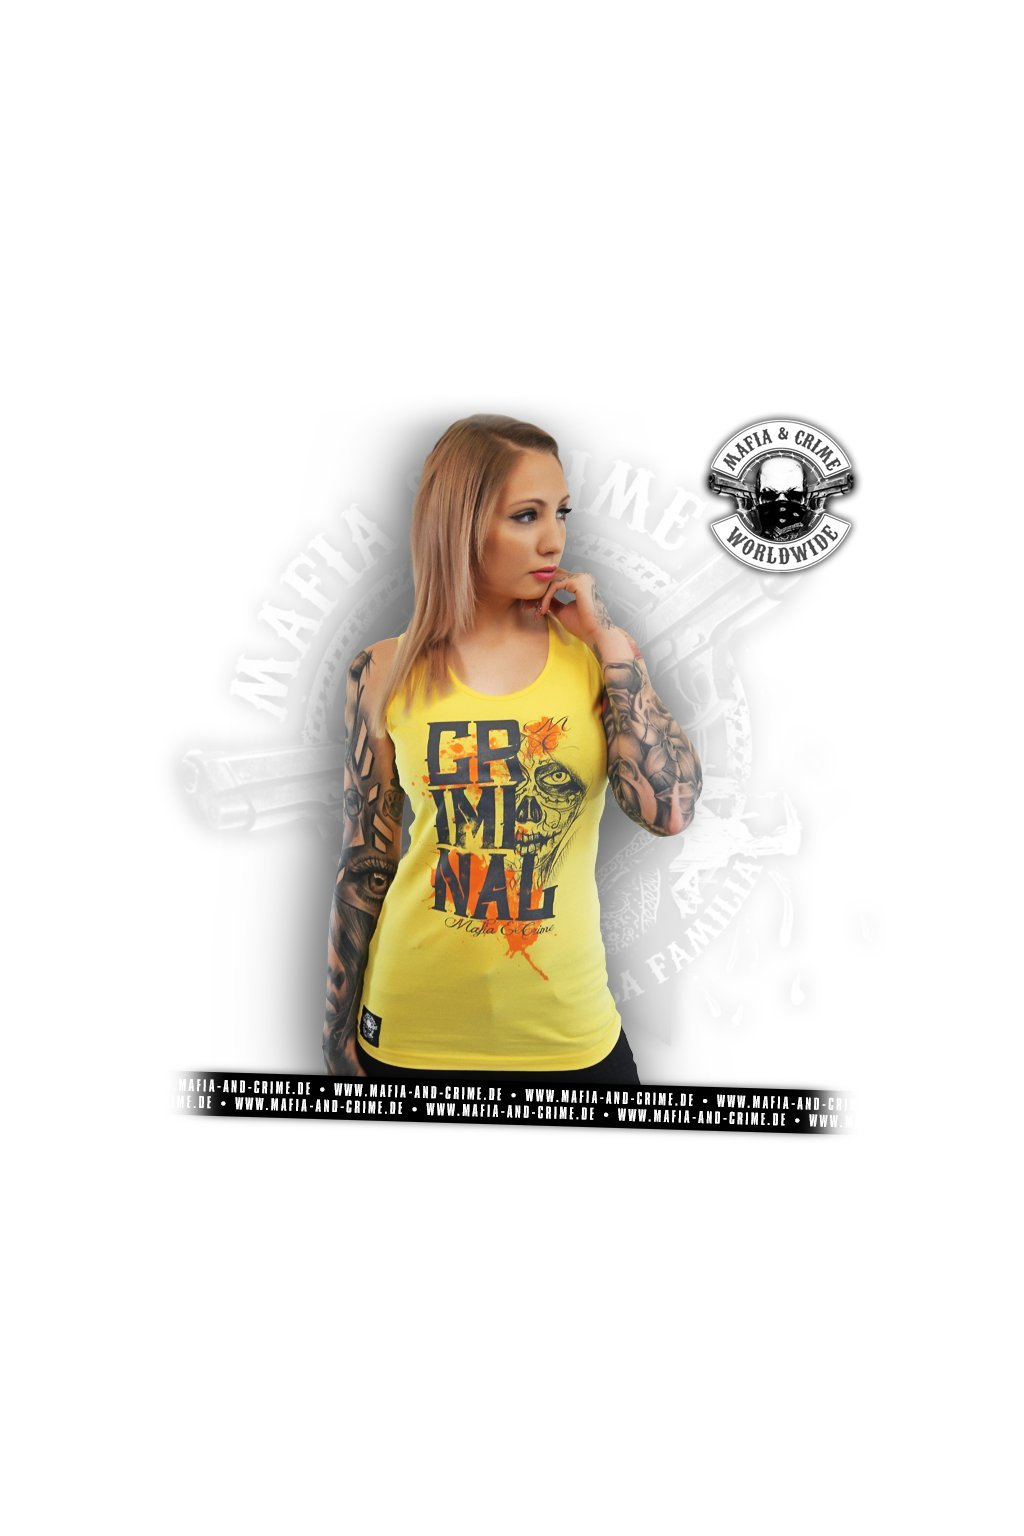 Dámské tílko Mafia & Crime CRIMINAL Tank Top gelb obr1